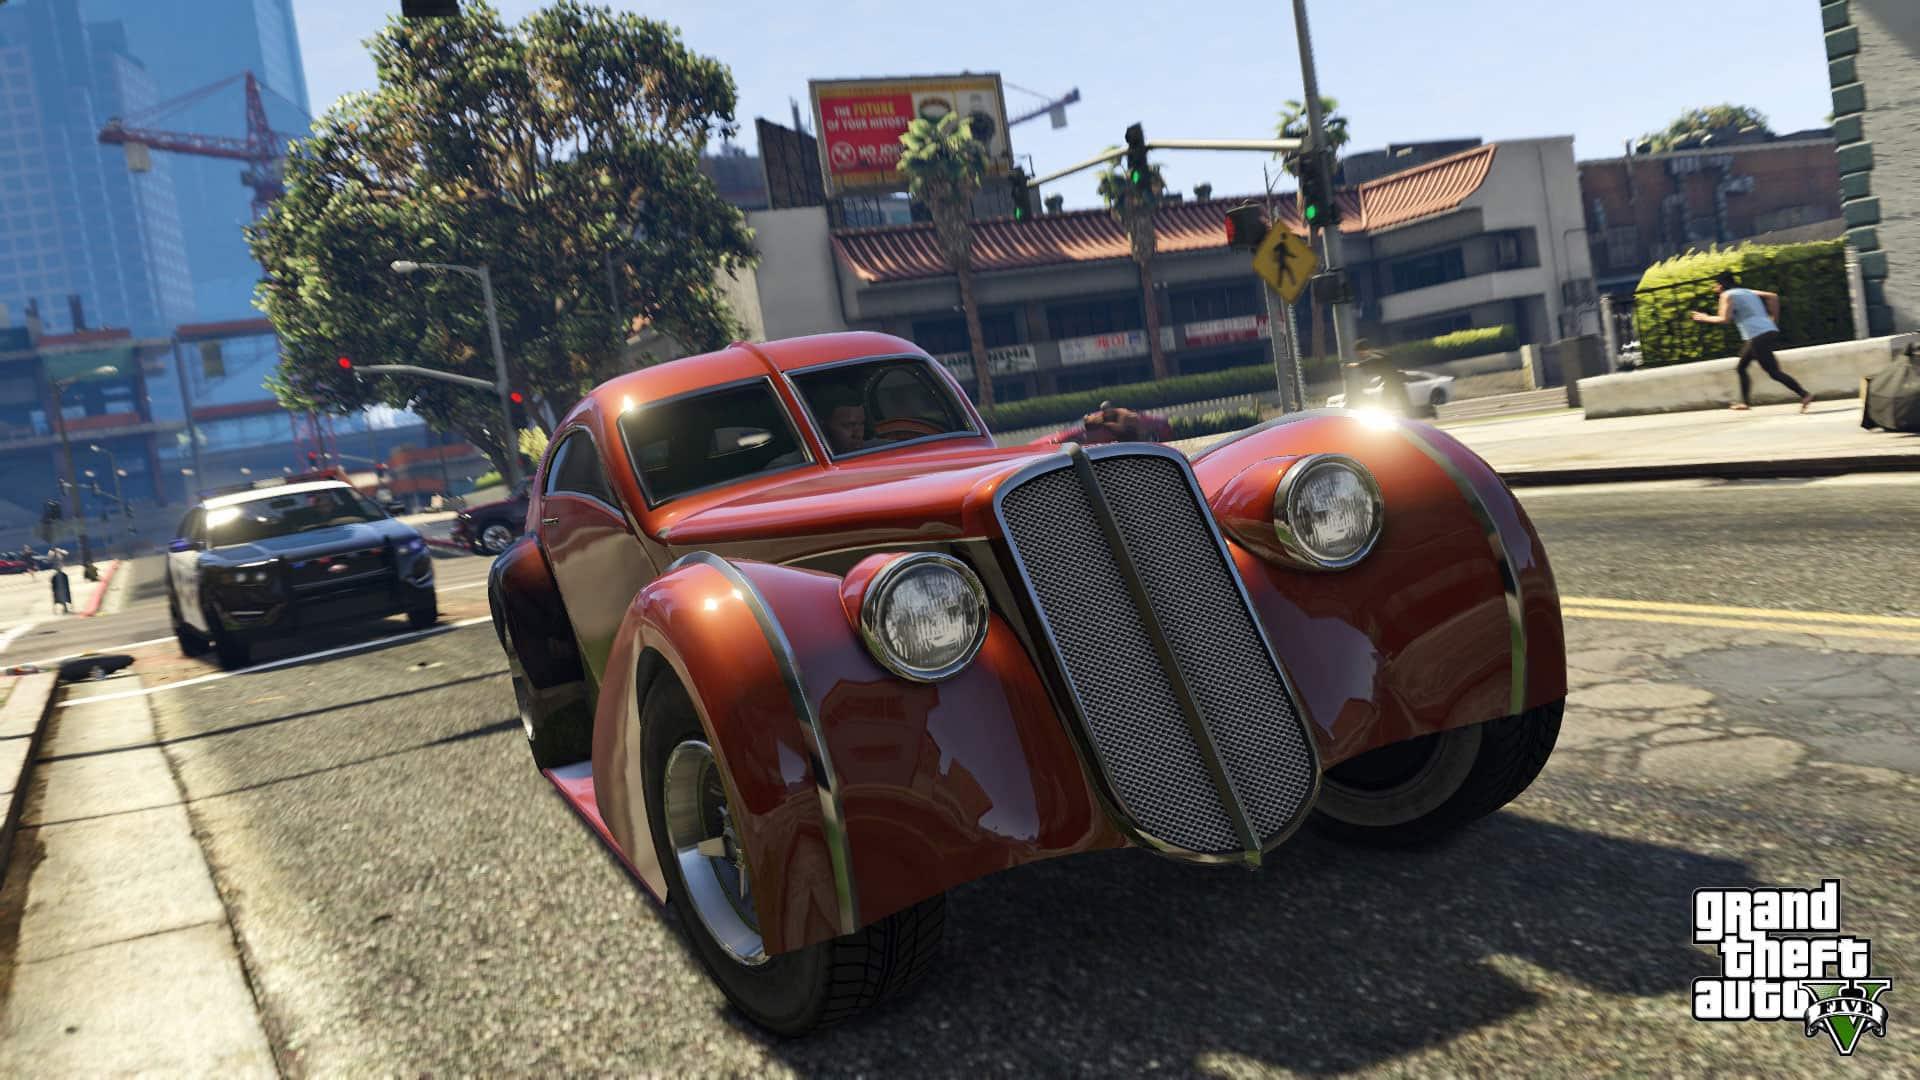 All the GTA V Next-Gen Screenshots - GTA 5 Cheats